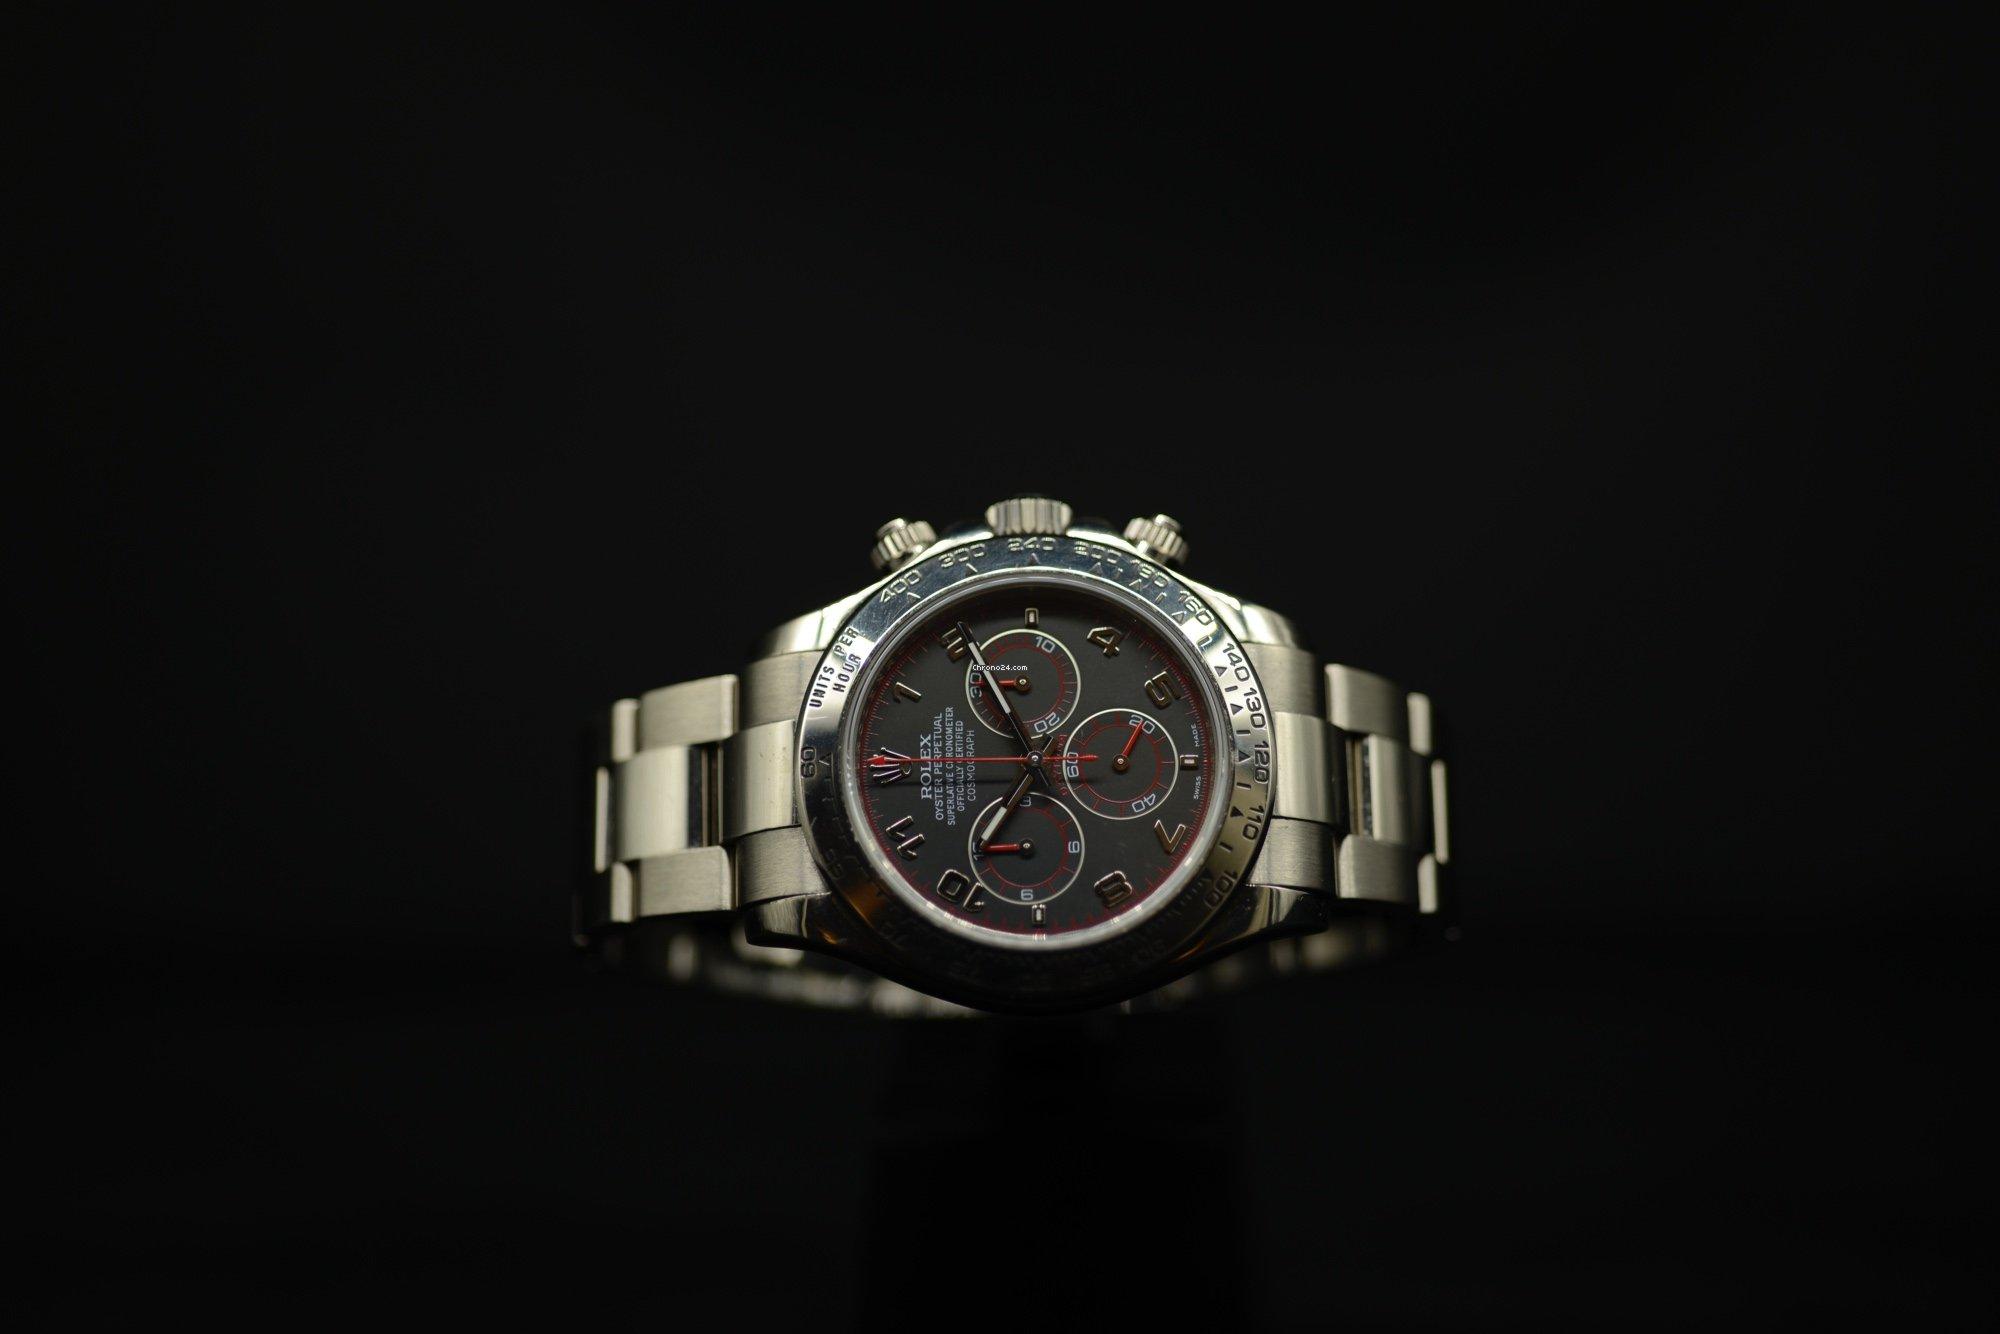 negozio online 5d075 80f88 Rolex Daytona 116509 oro bianco for $27,347 for sale from a ...